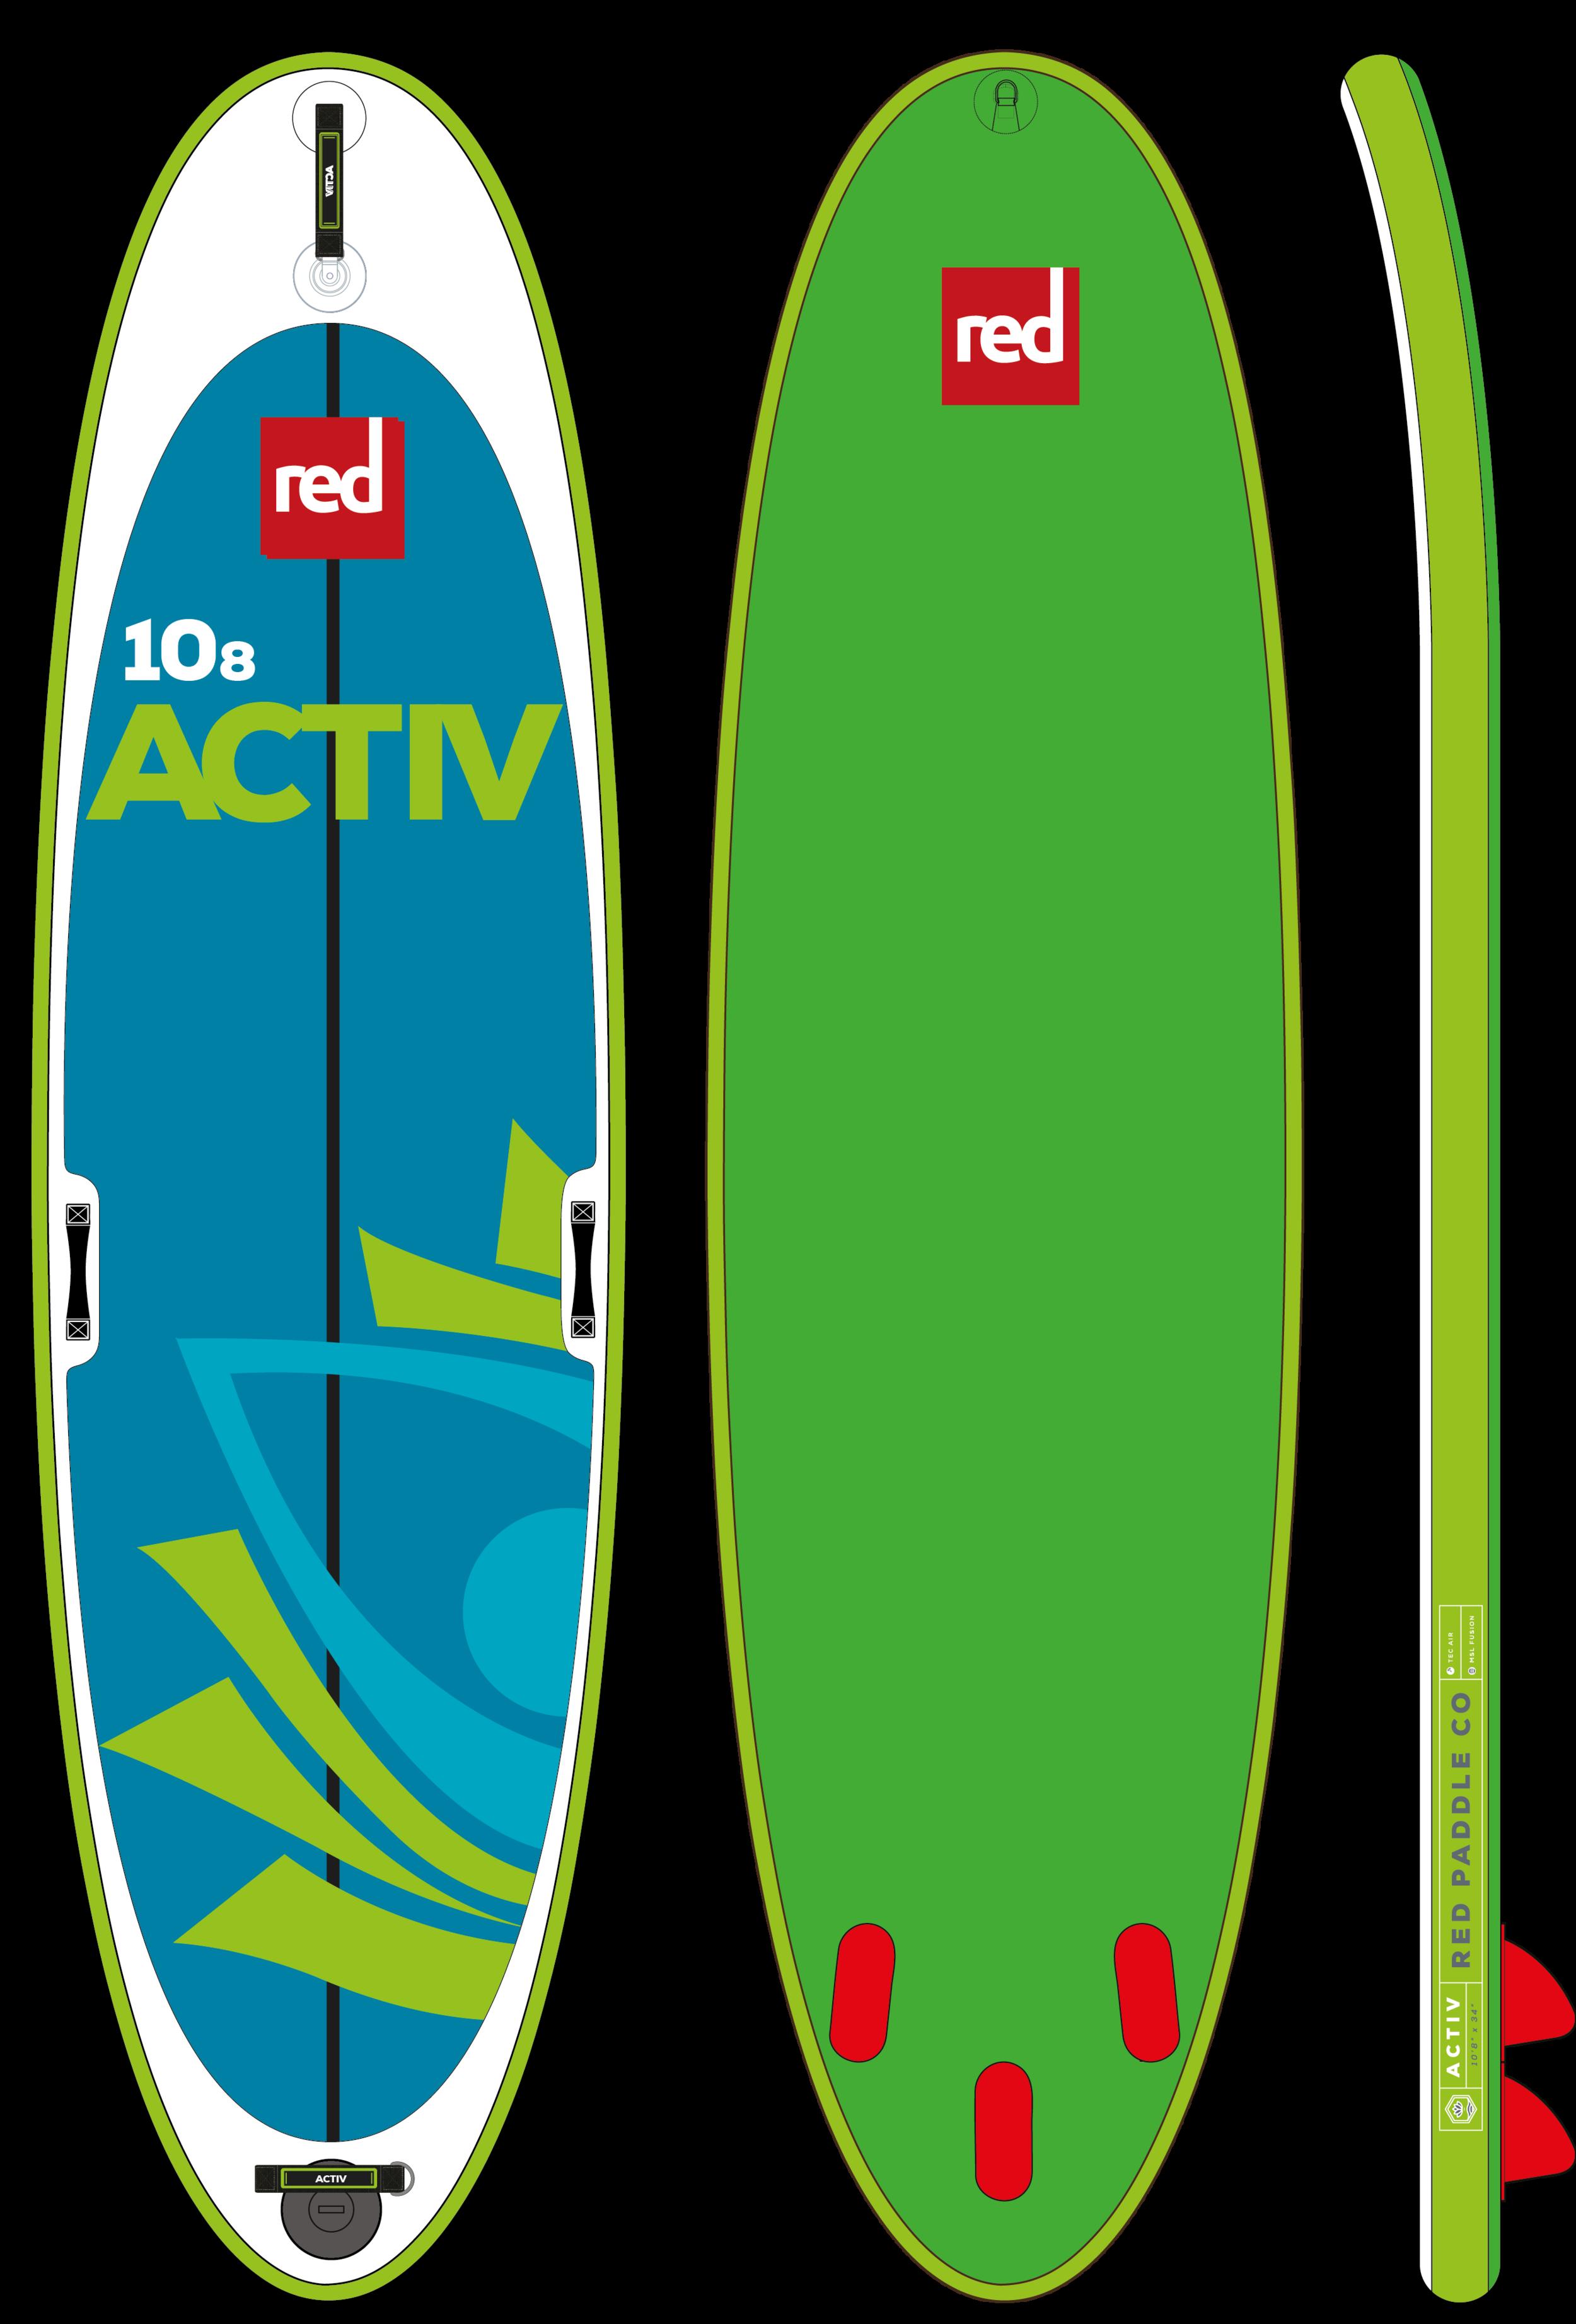 10'8 Active  - 10'8 x 34